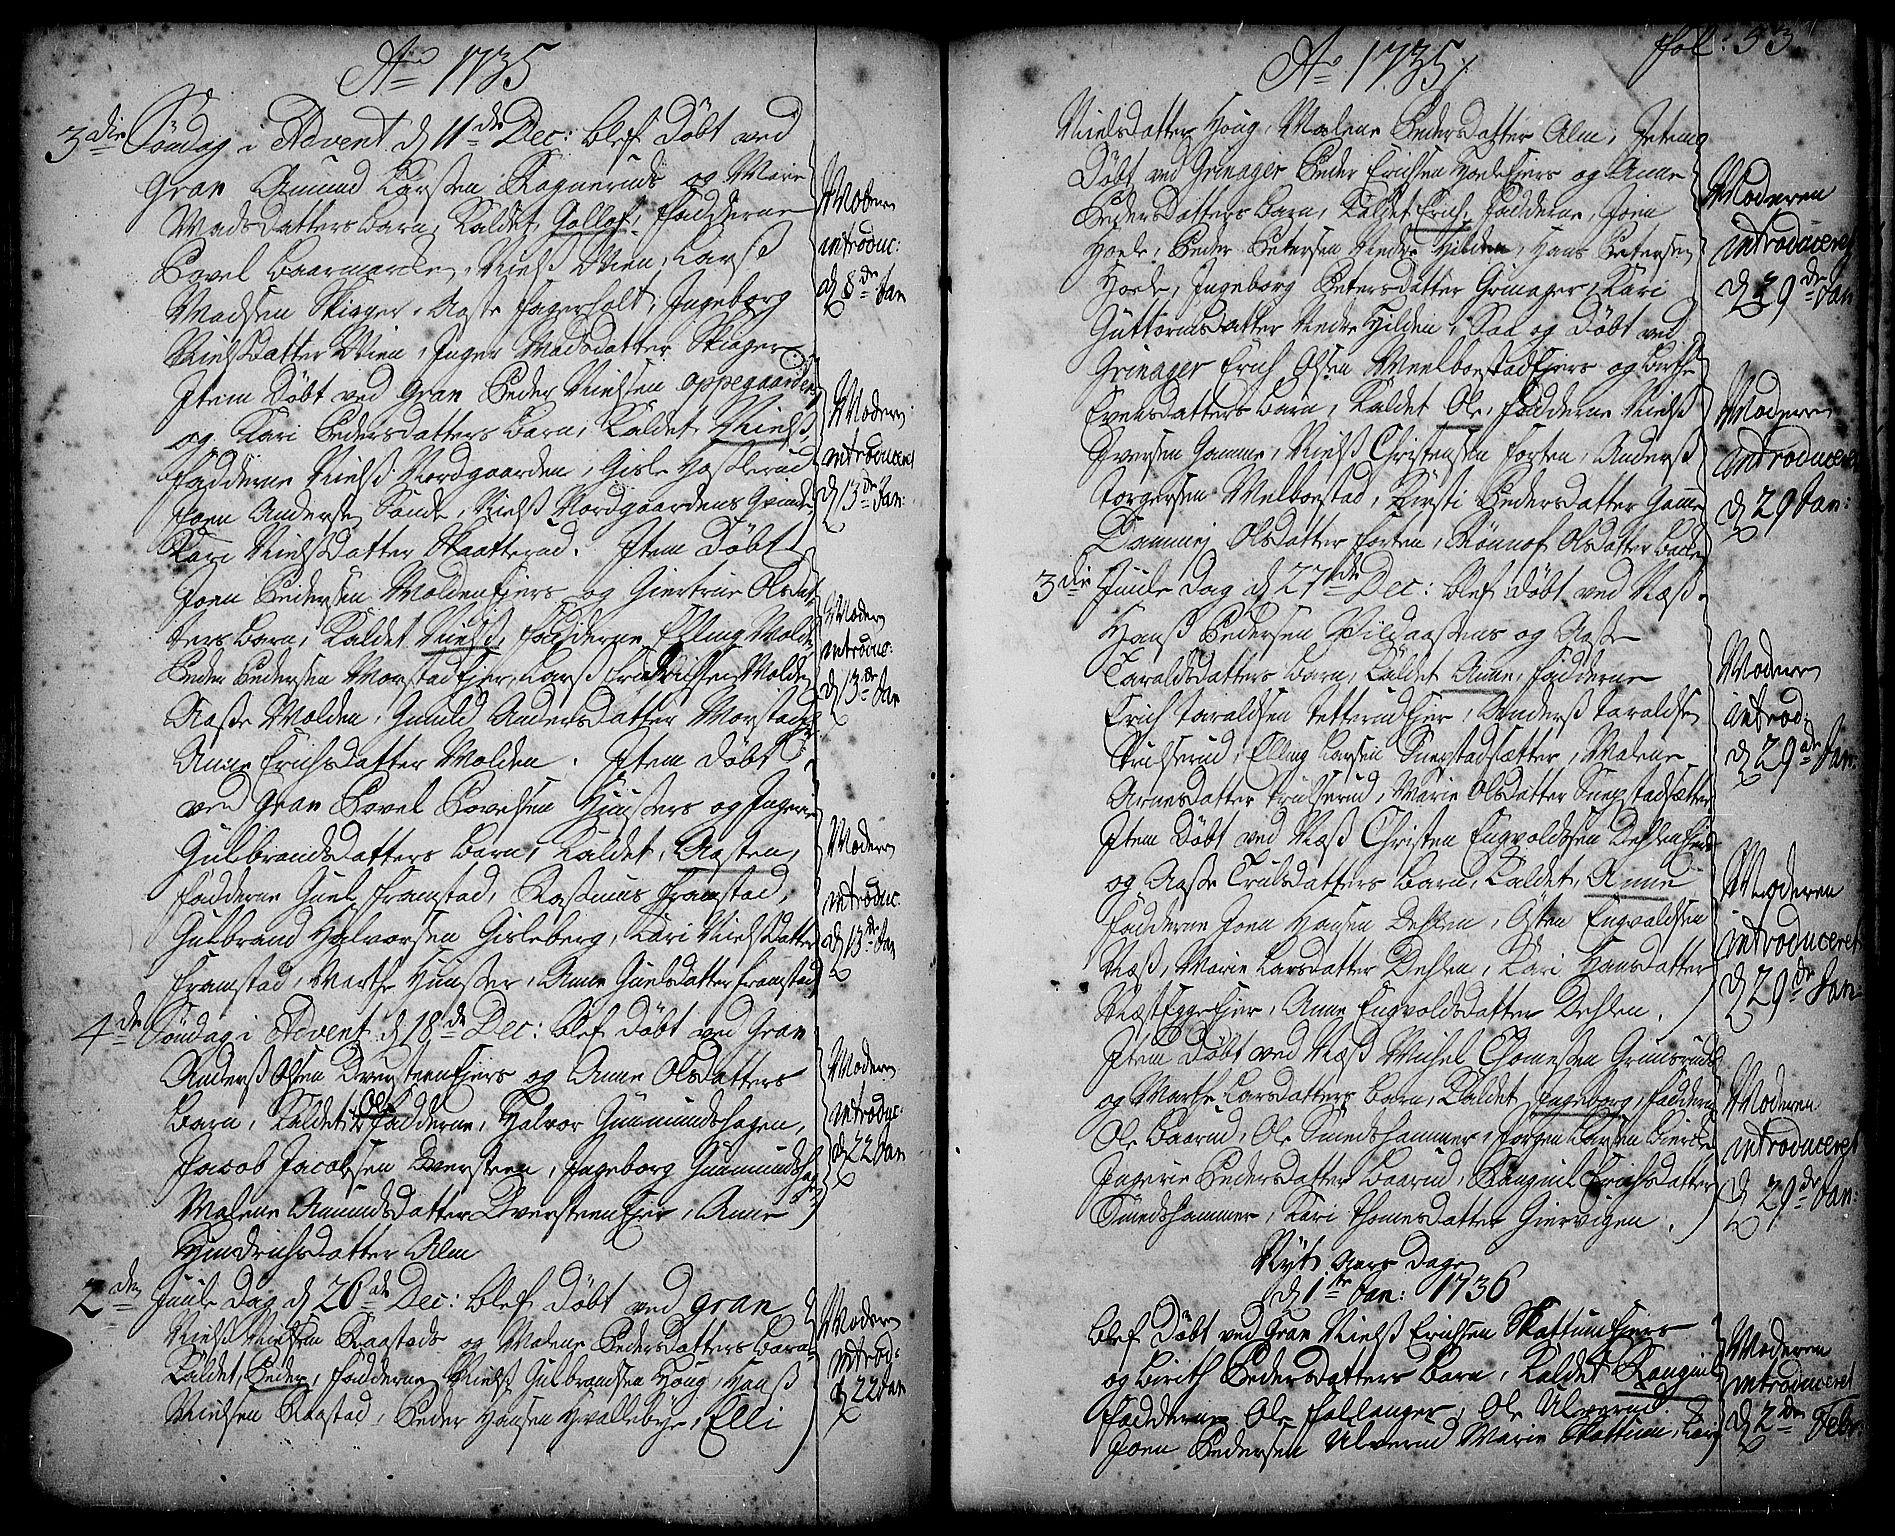 SAH, Gran prestekontor, Ministerialbok nr. 2, 1732-1744, s. 53